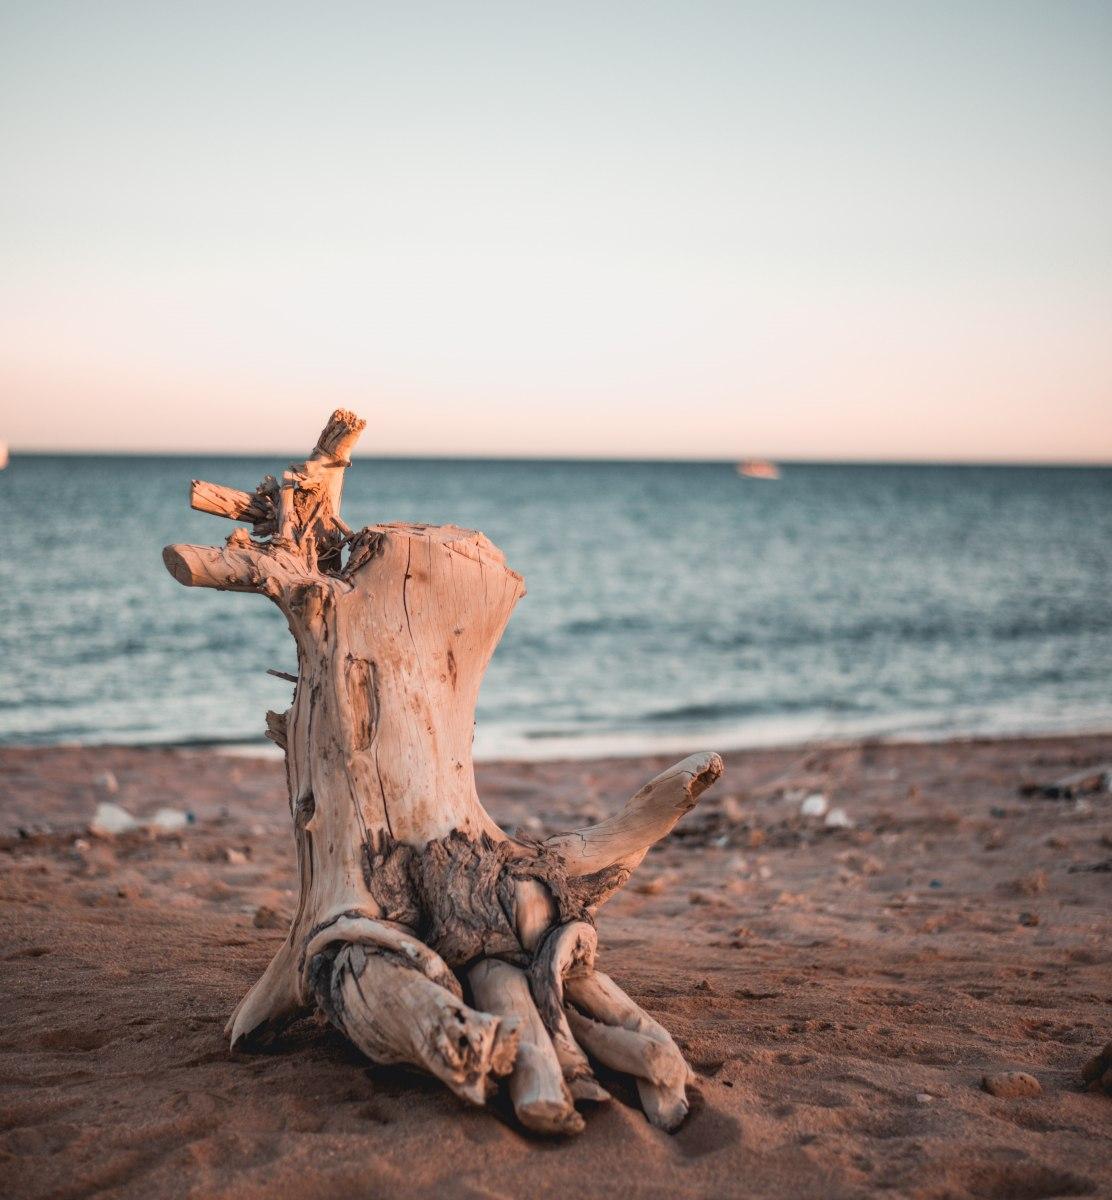 driftwood on the beach